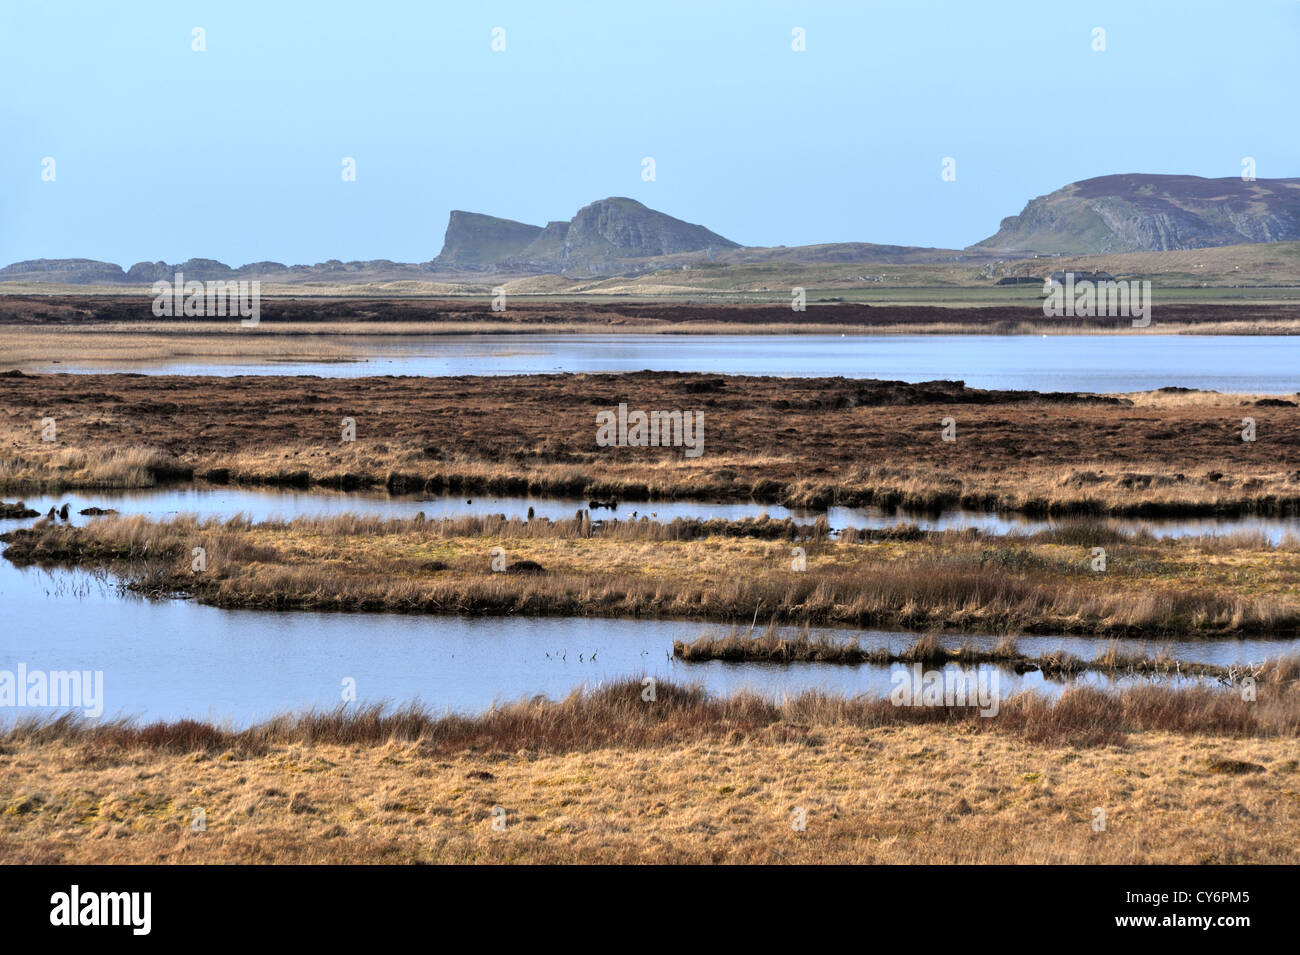 Isle of Islay, Scotland - Stock Image